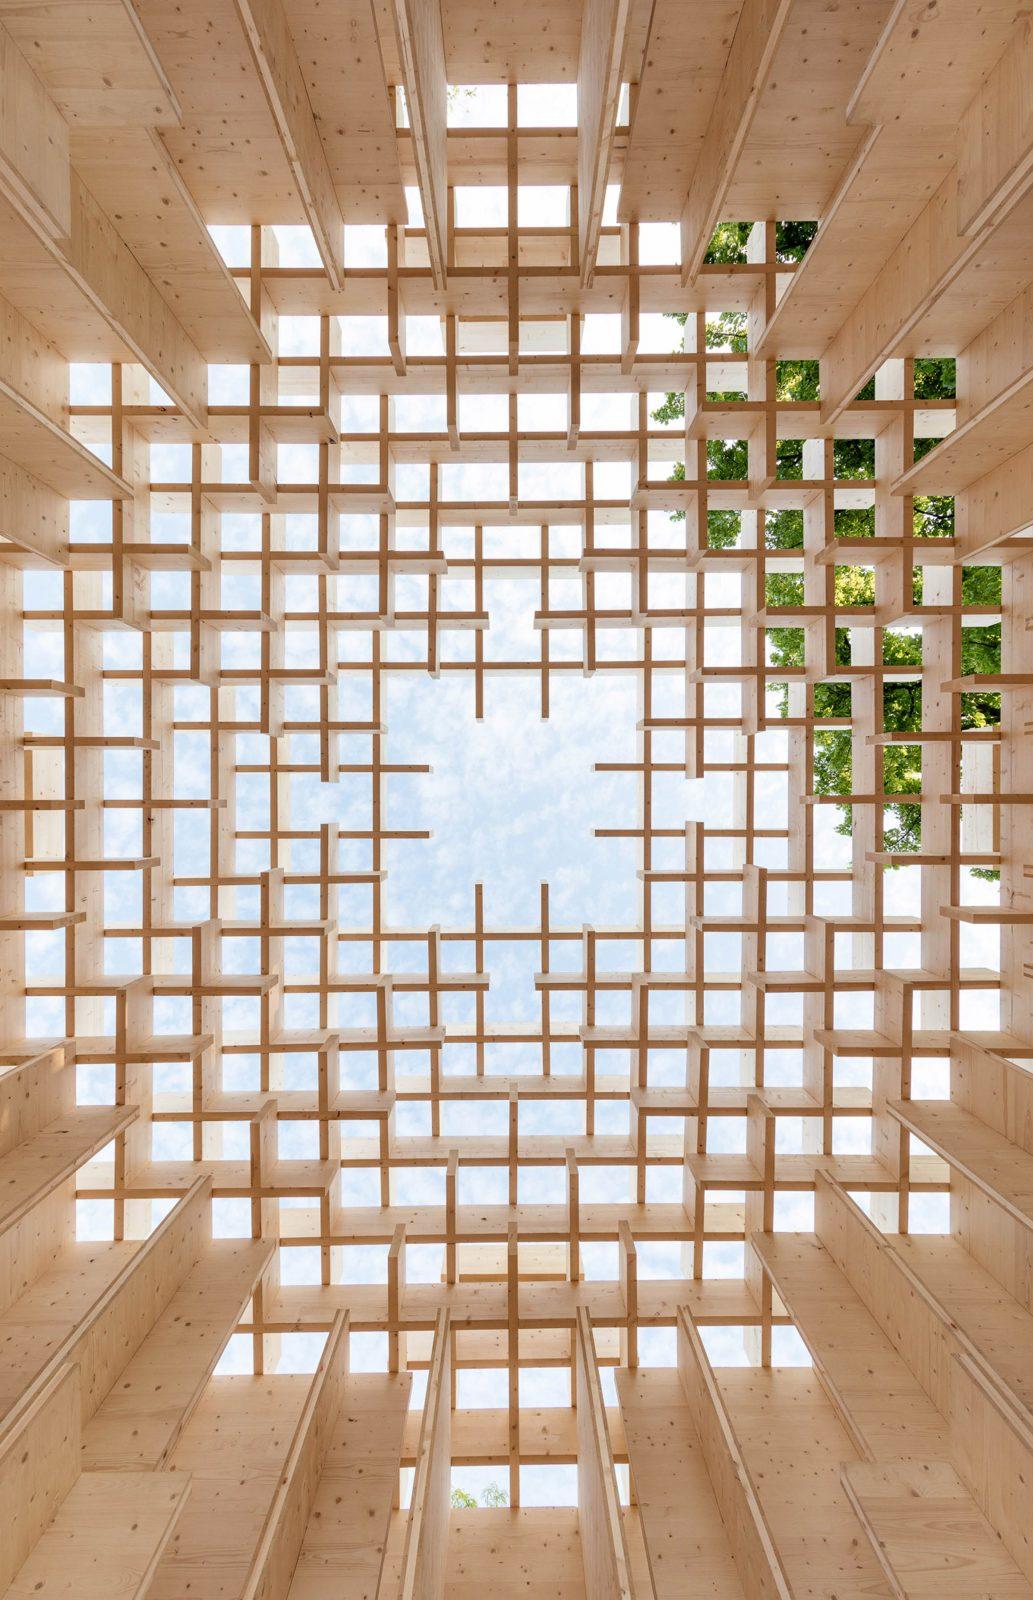 KjellanderSjober The Forests of Venice roof